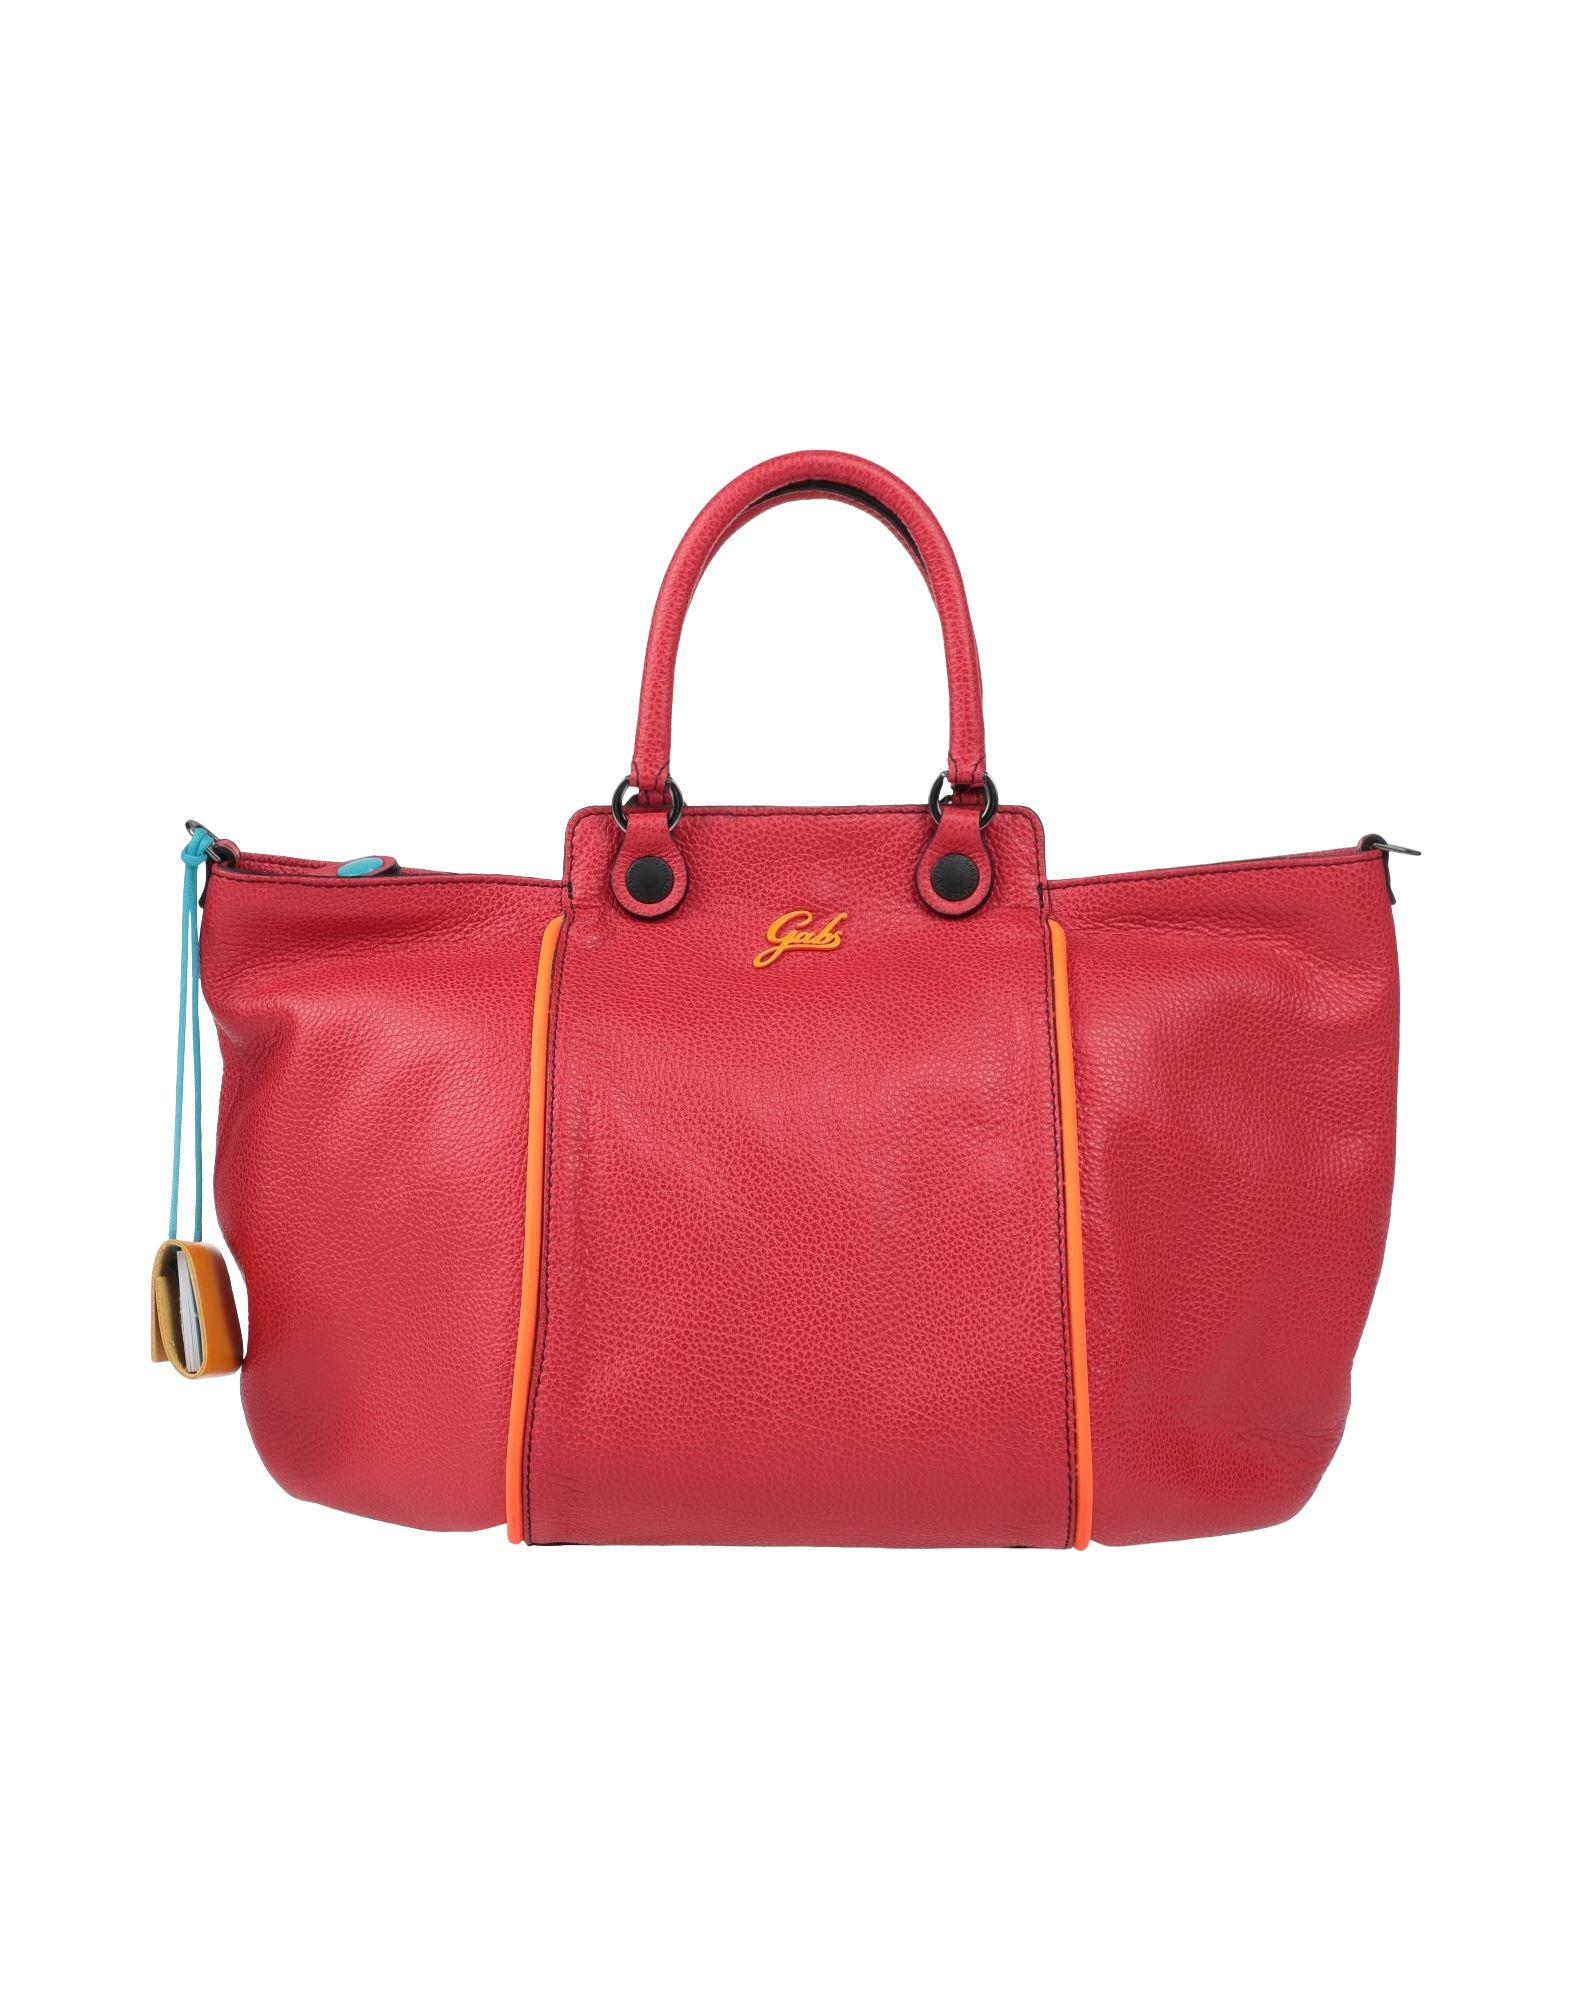 GABS Shoulder bags - Item 45564656